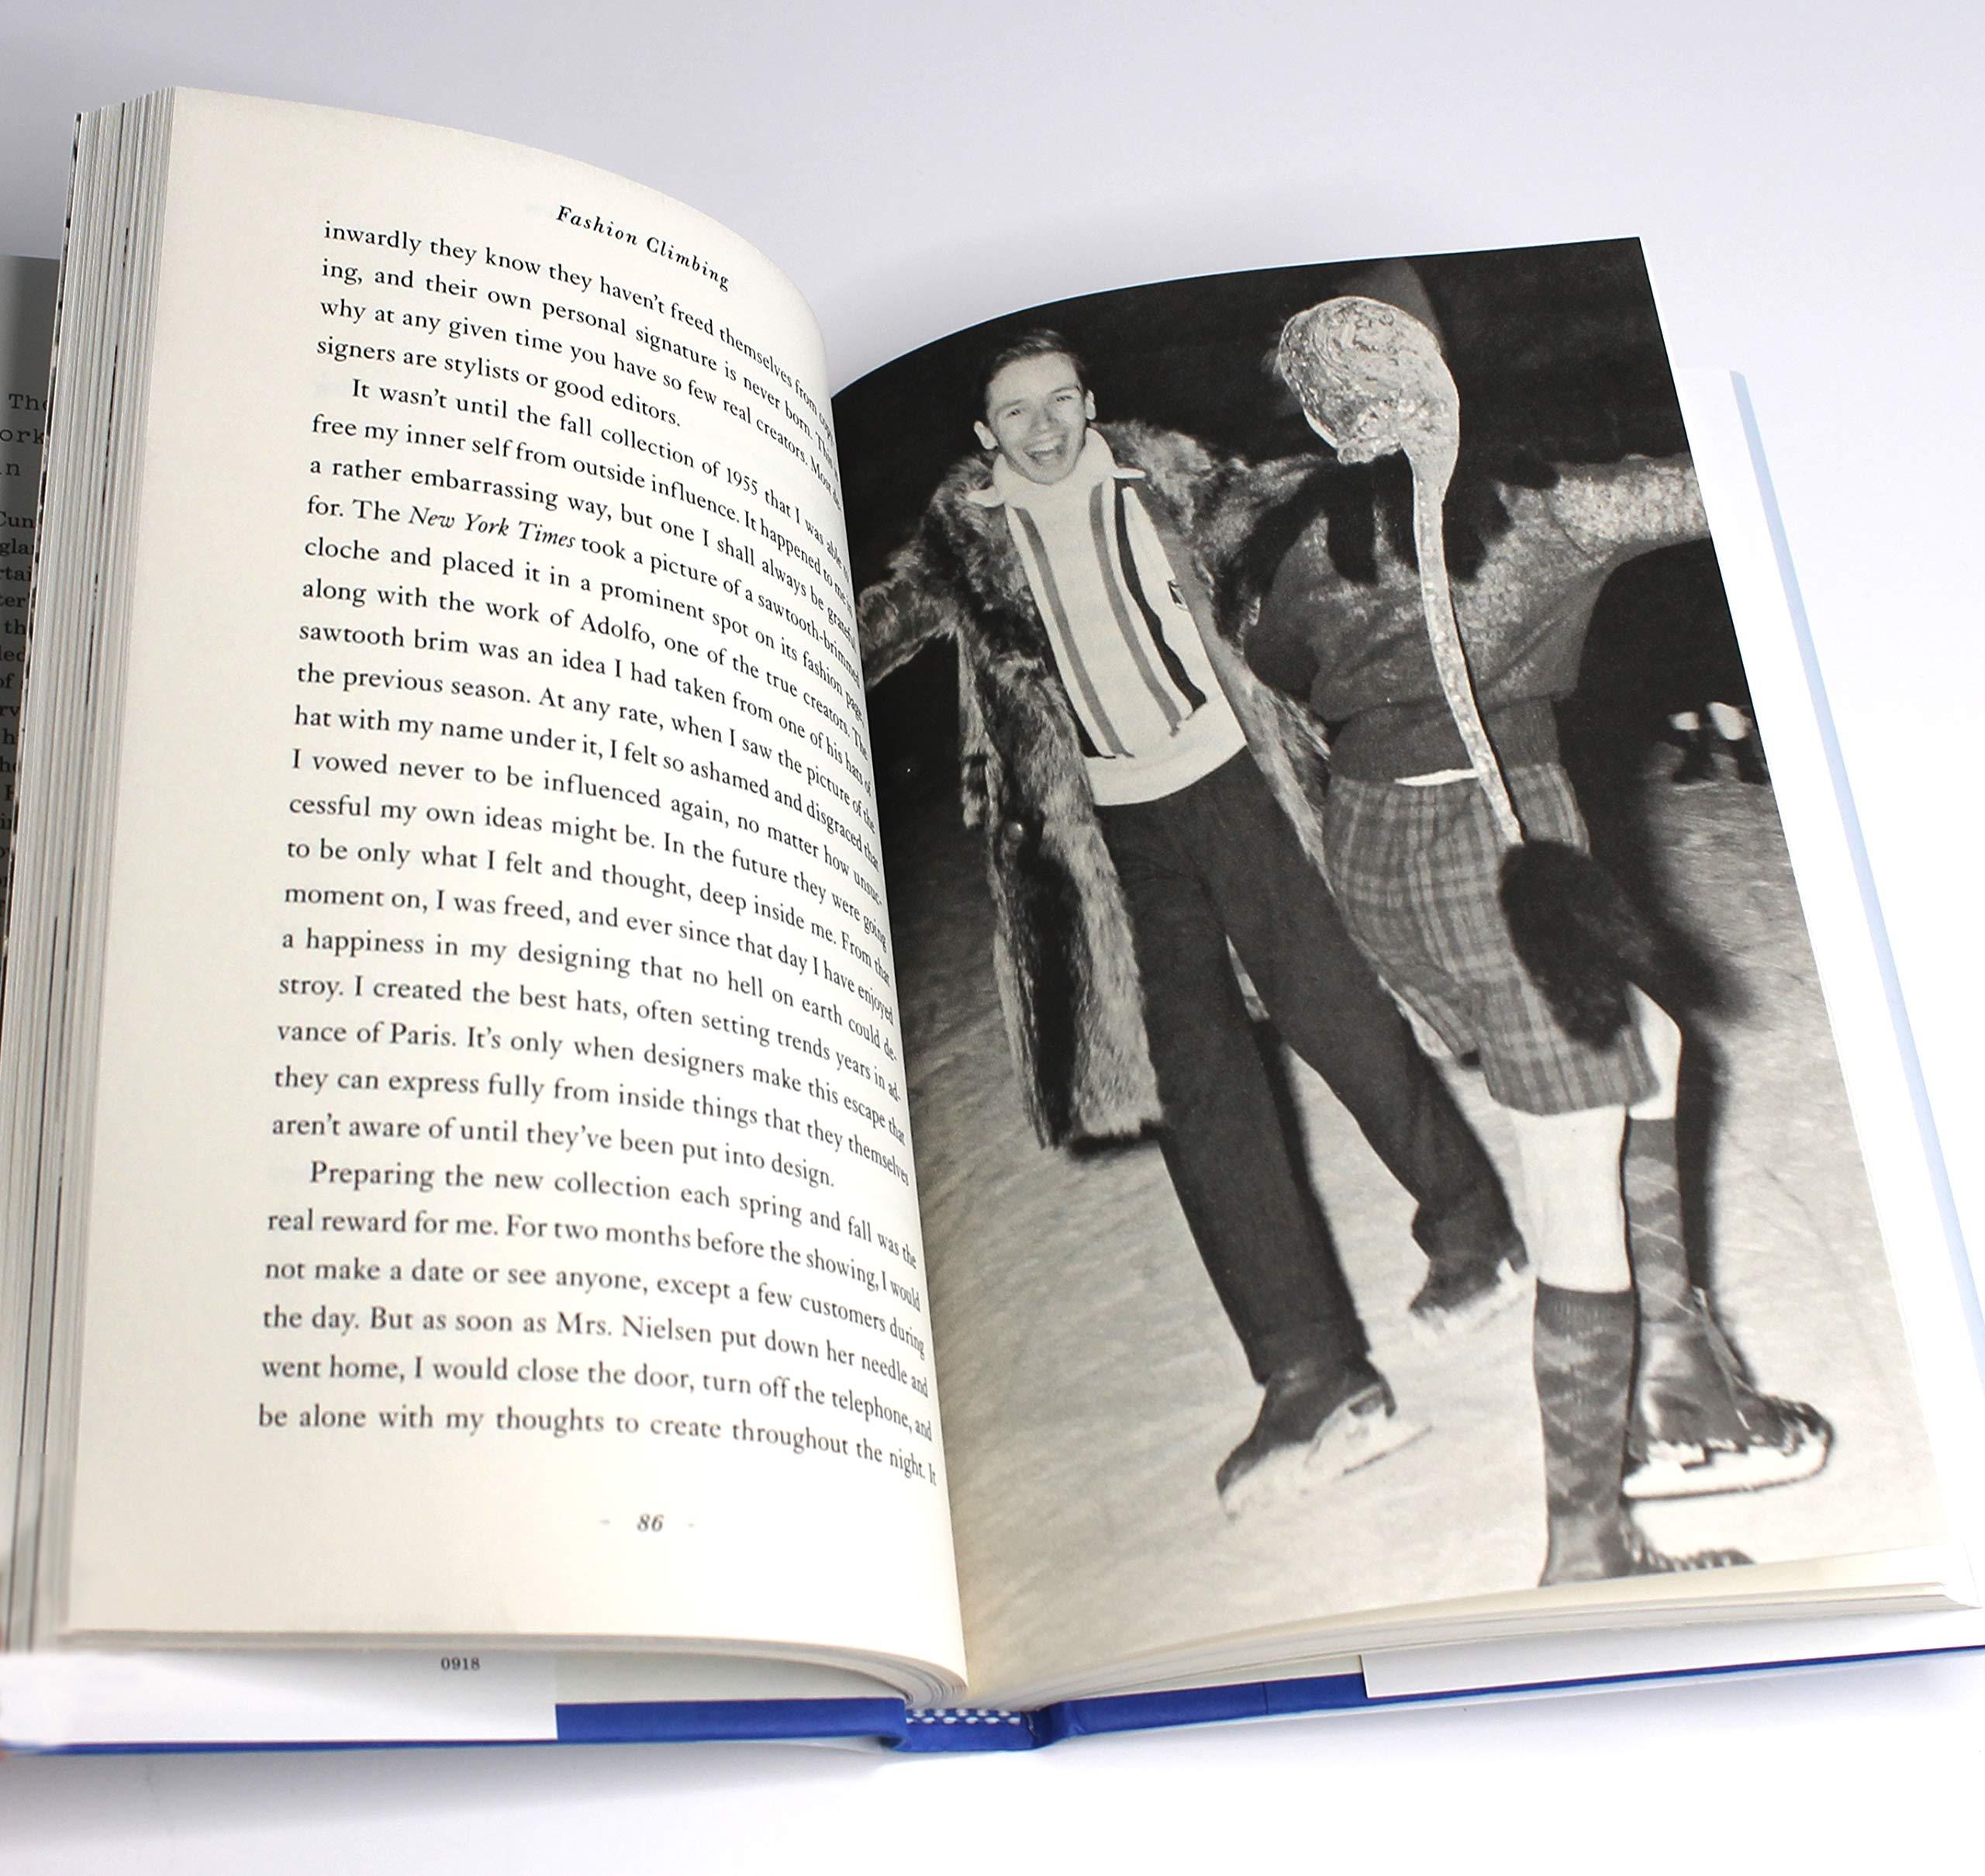 Fashion Climbing: Amazon.es: Bill Cunningham: Libros en idiomas extranjeros